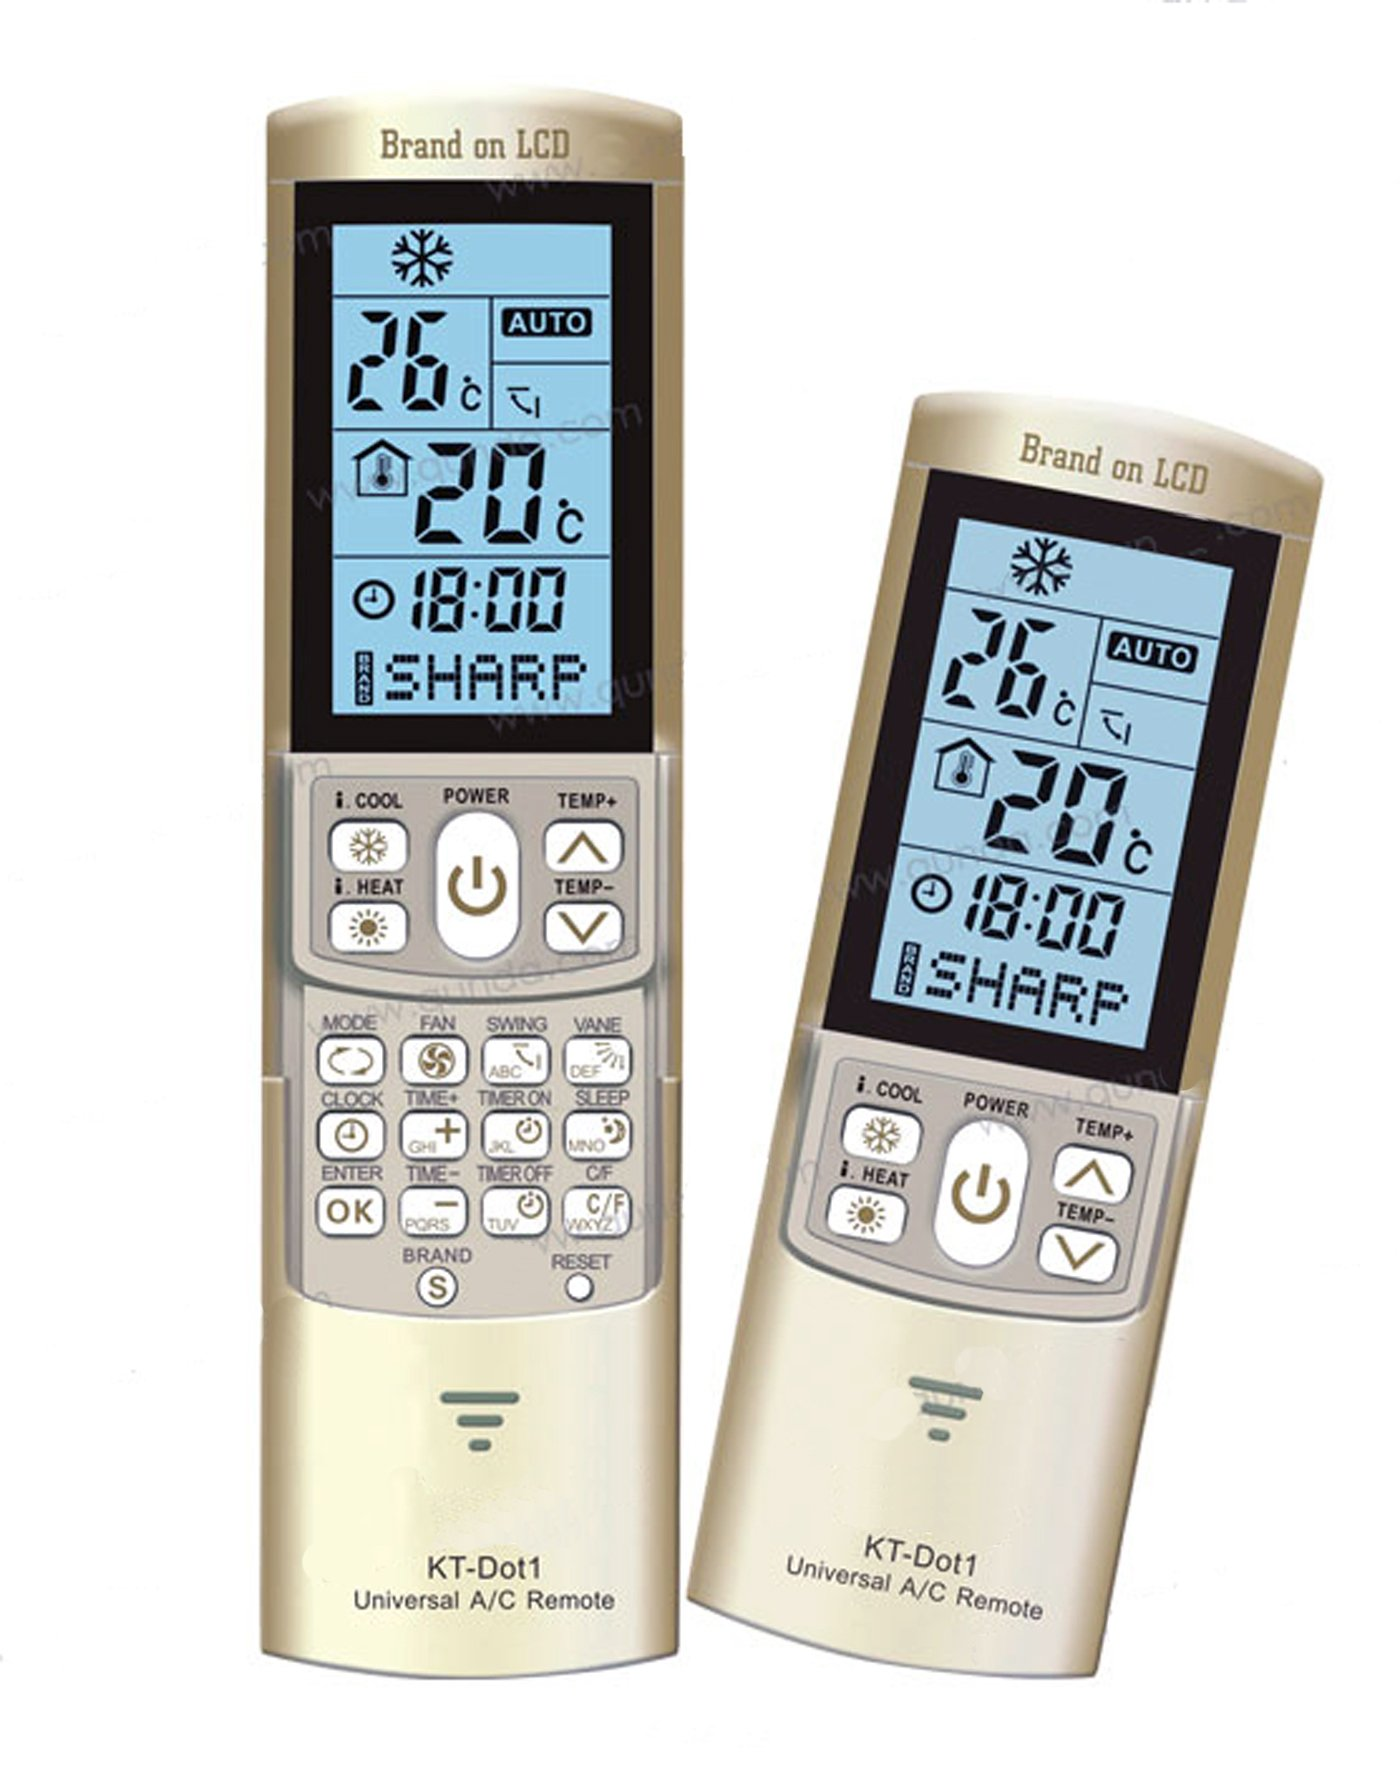 (Ship from USA) KT-DOT1 Universal LCD Remote Control Qunda Air Conditioner /ITEM#H3NG UE-EW23D26344